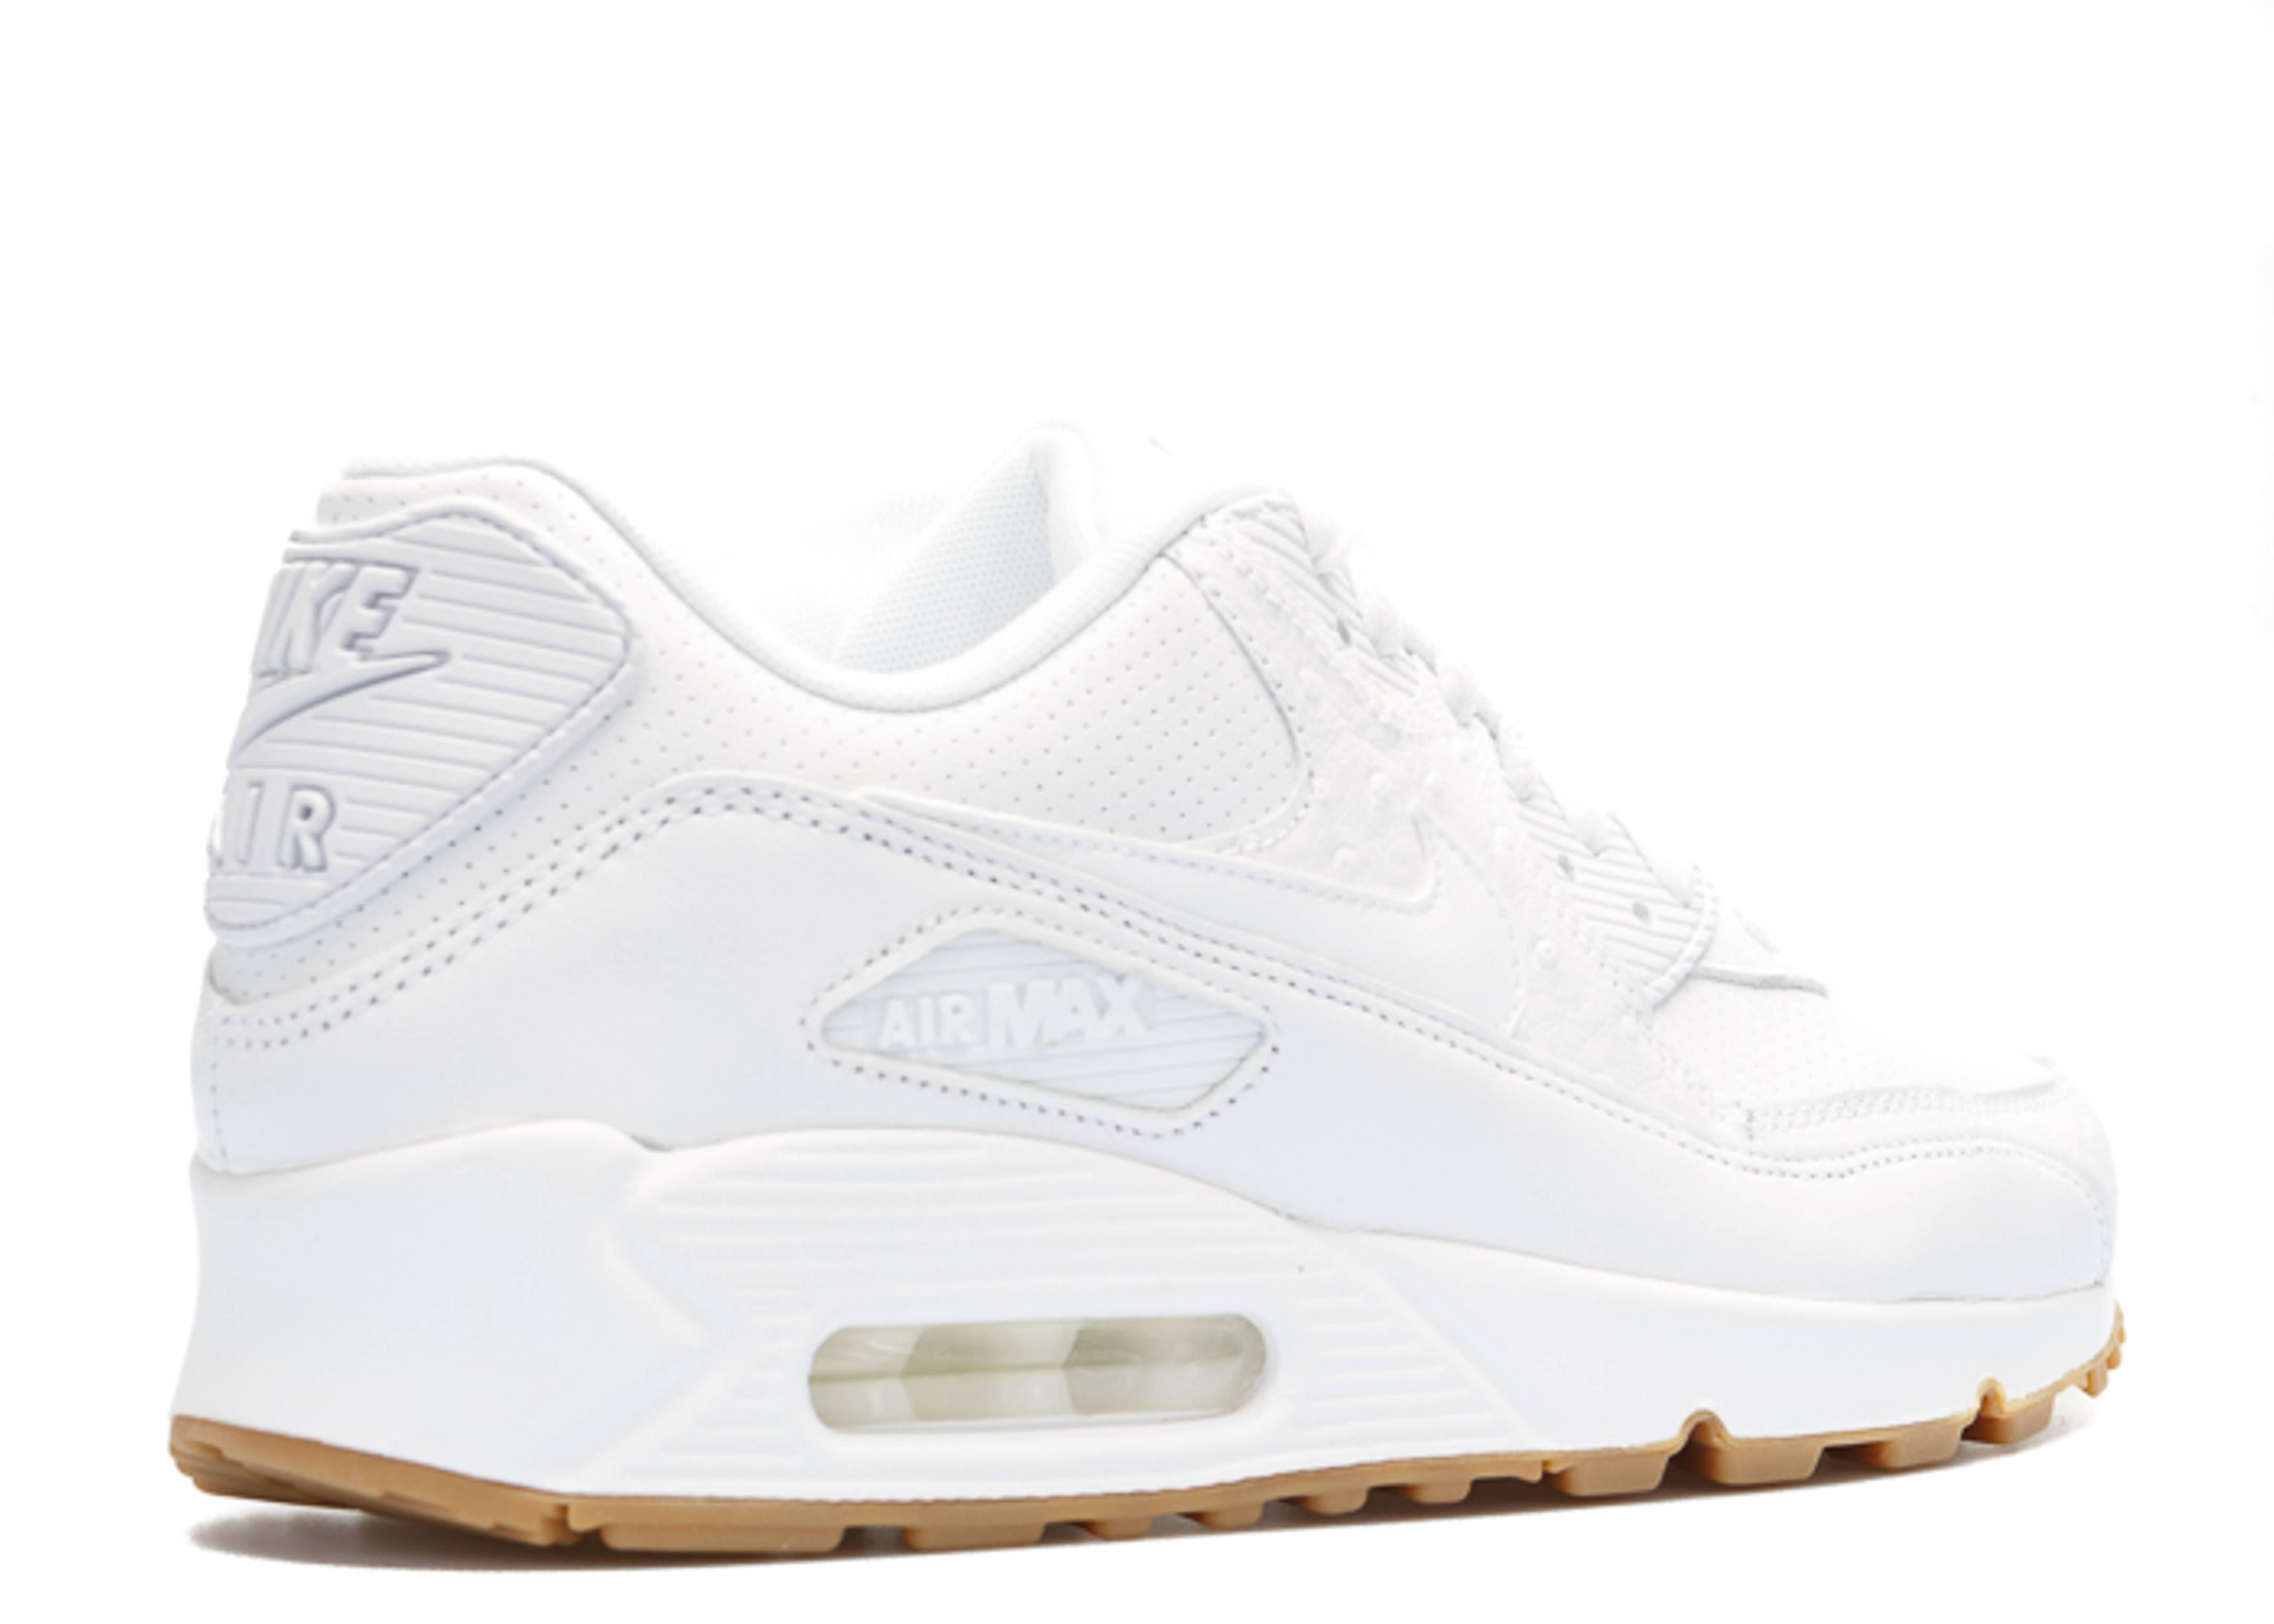 Air Max 90 Leather Pa - Nike - 705012 111 - white white-gum light ... 894f83187